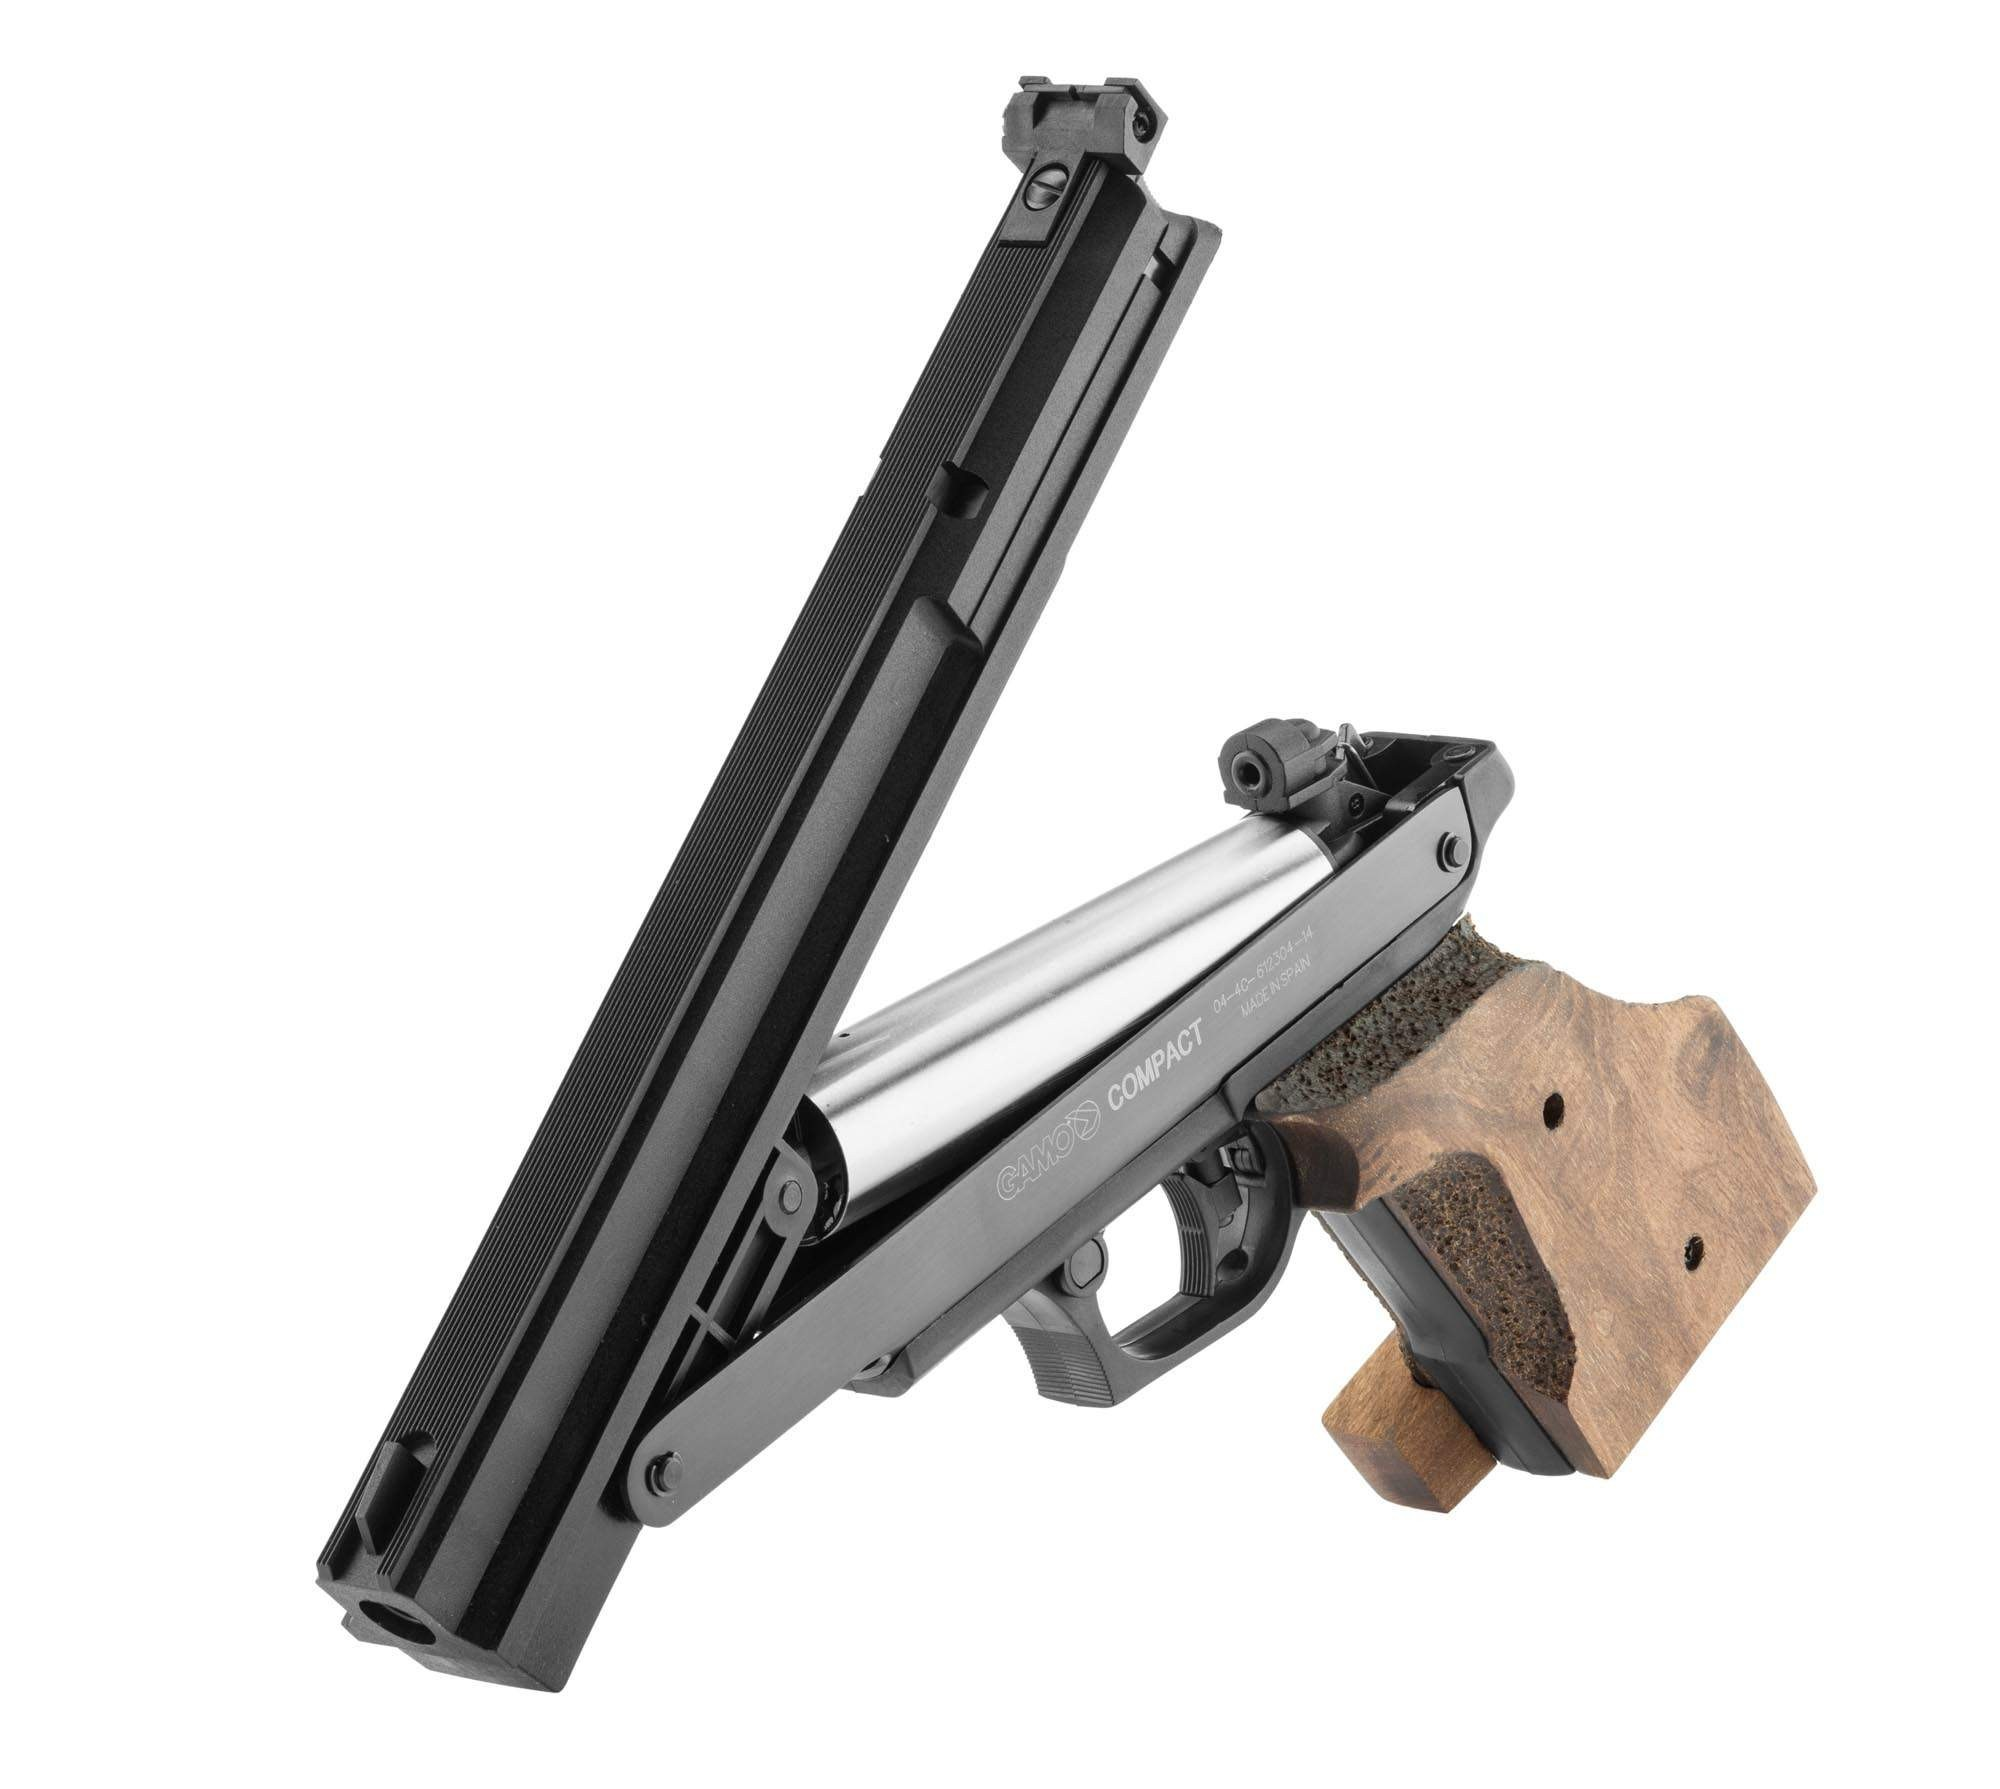 pistolet air comprim gamo compact gaucher cal 4 5 mm pistolets air comprim co2 made. Black Bedroom Furniture Sets. Home Design Ideas